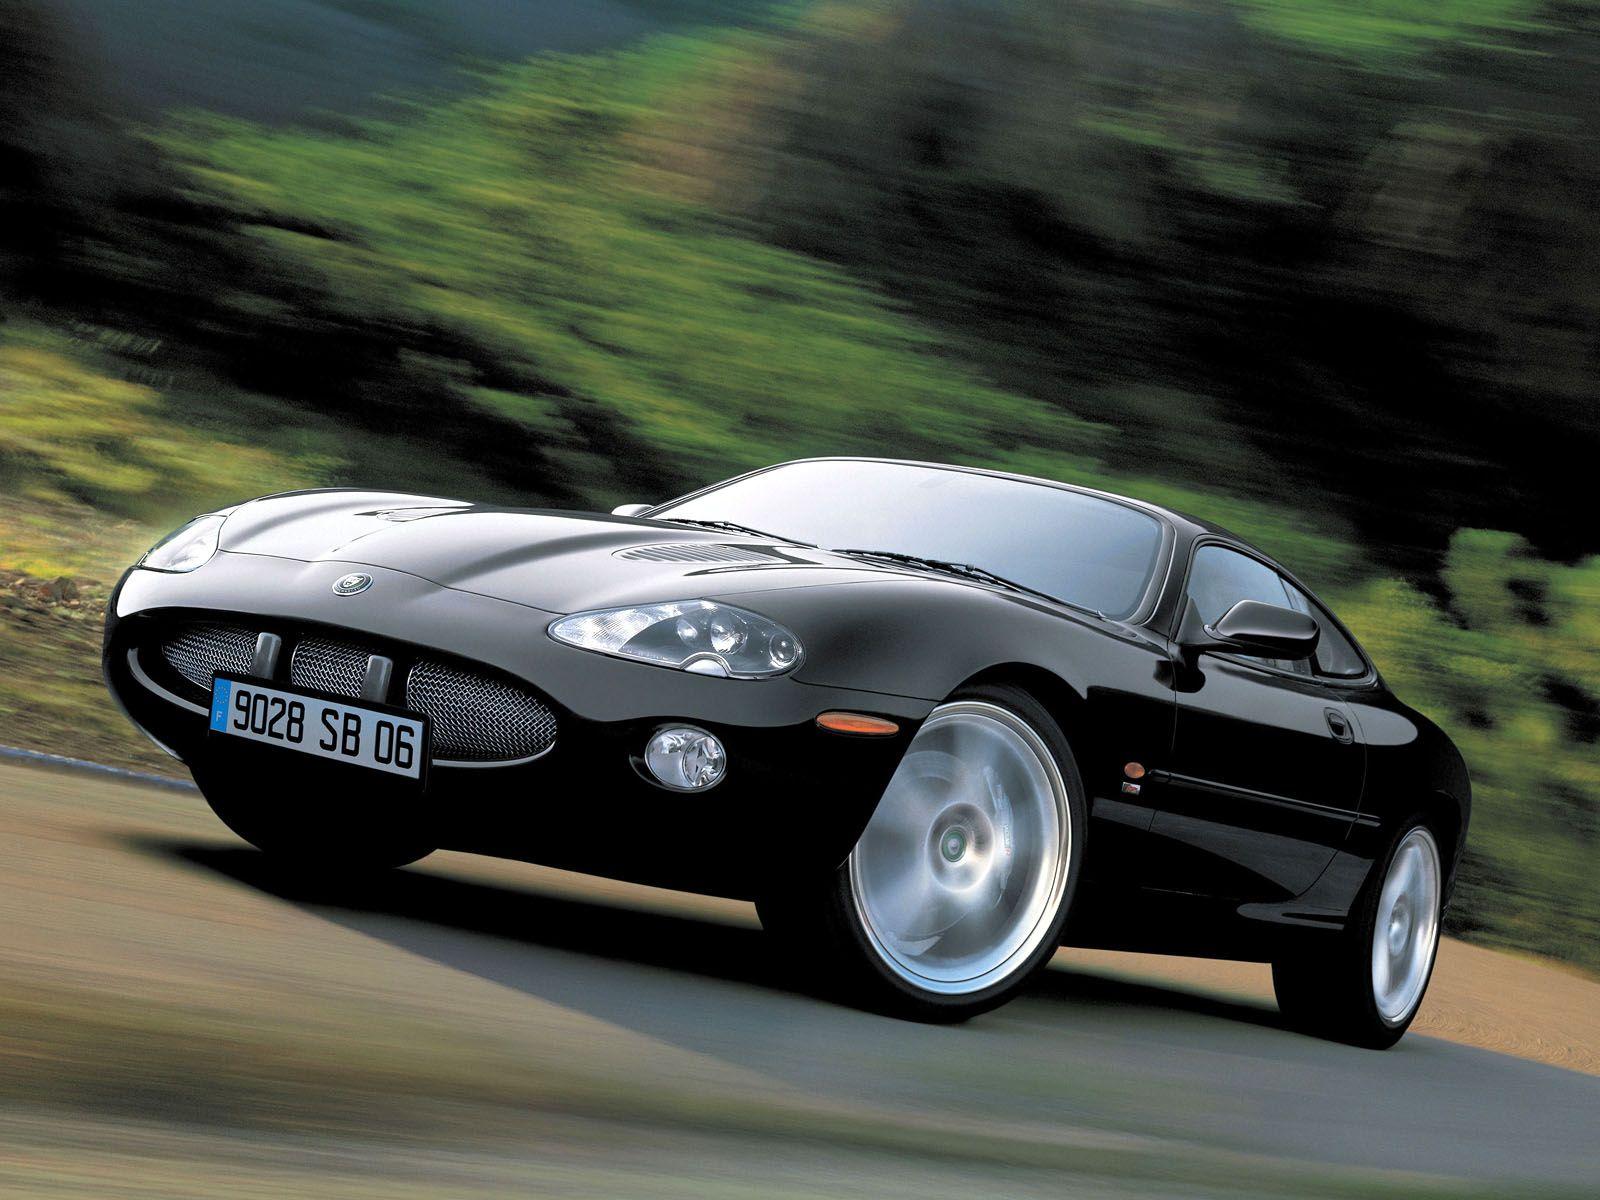 Honda Cr V Se >> Cars updates: jaguar xk